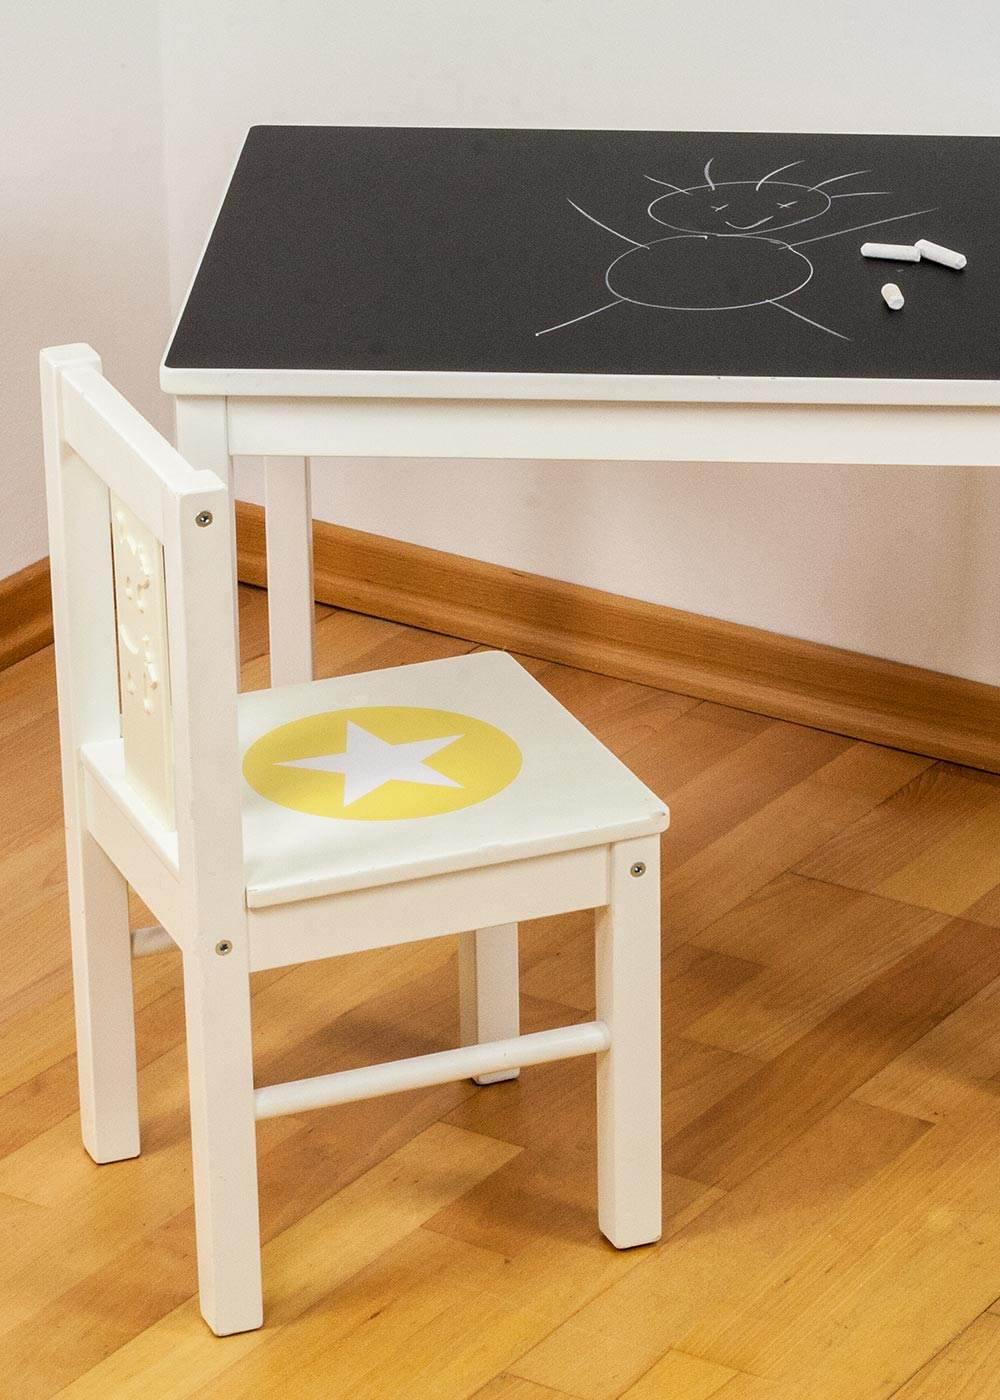 Ikea Kritter Kindertisch Ideenreich Tafelfolie  Detailansicht Stuhl